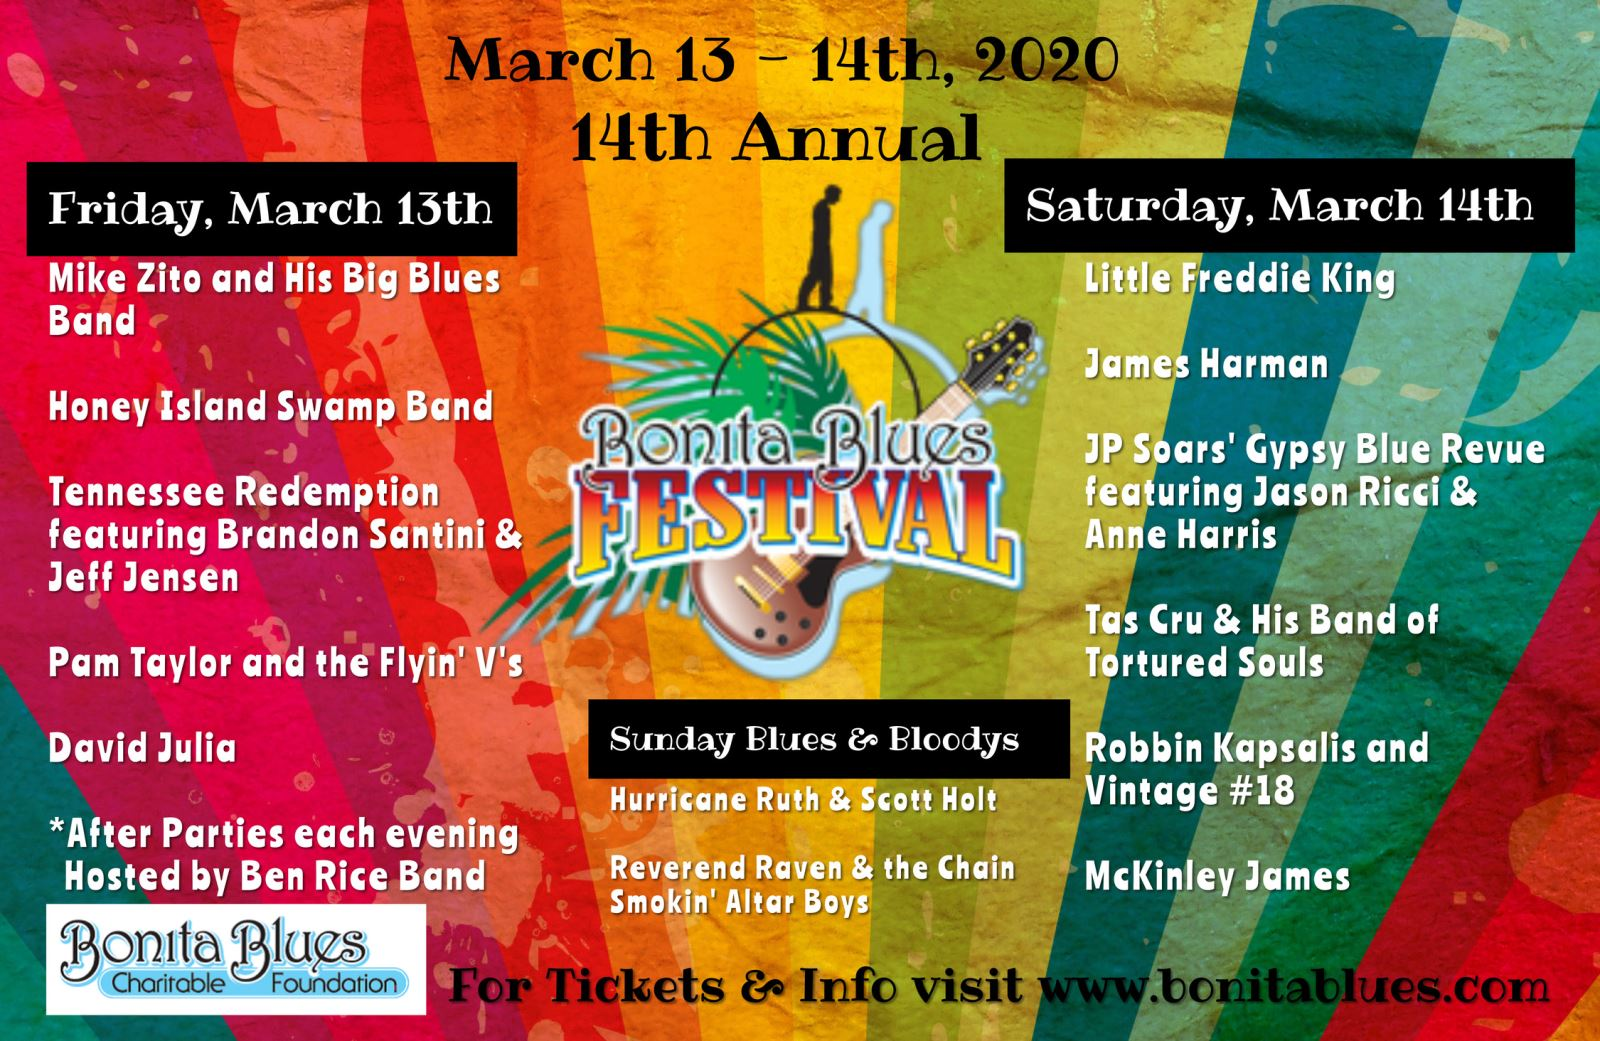 Bonita Blues Festival